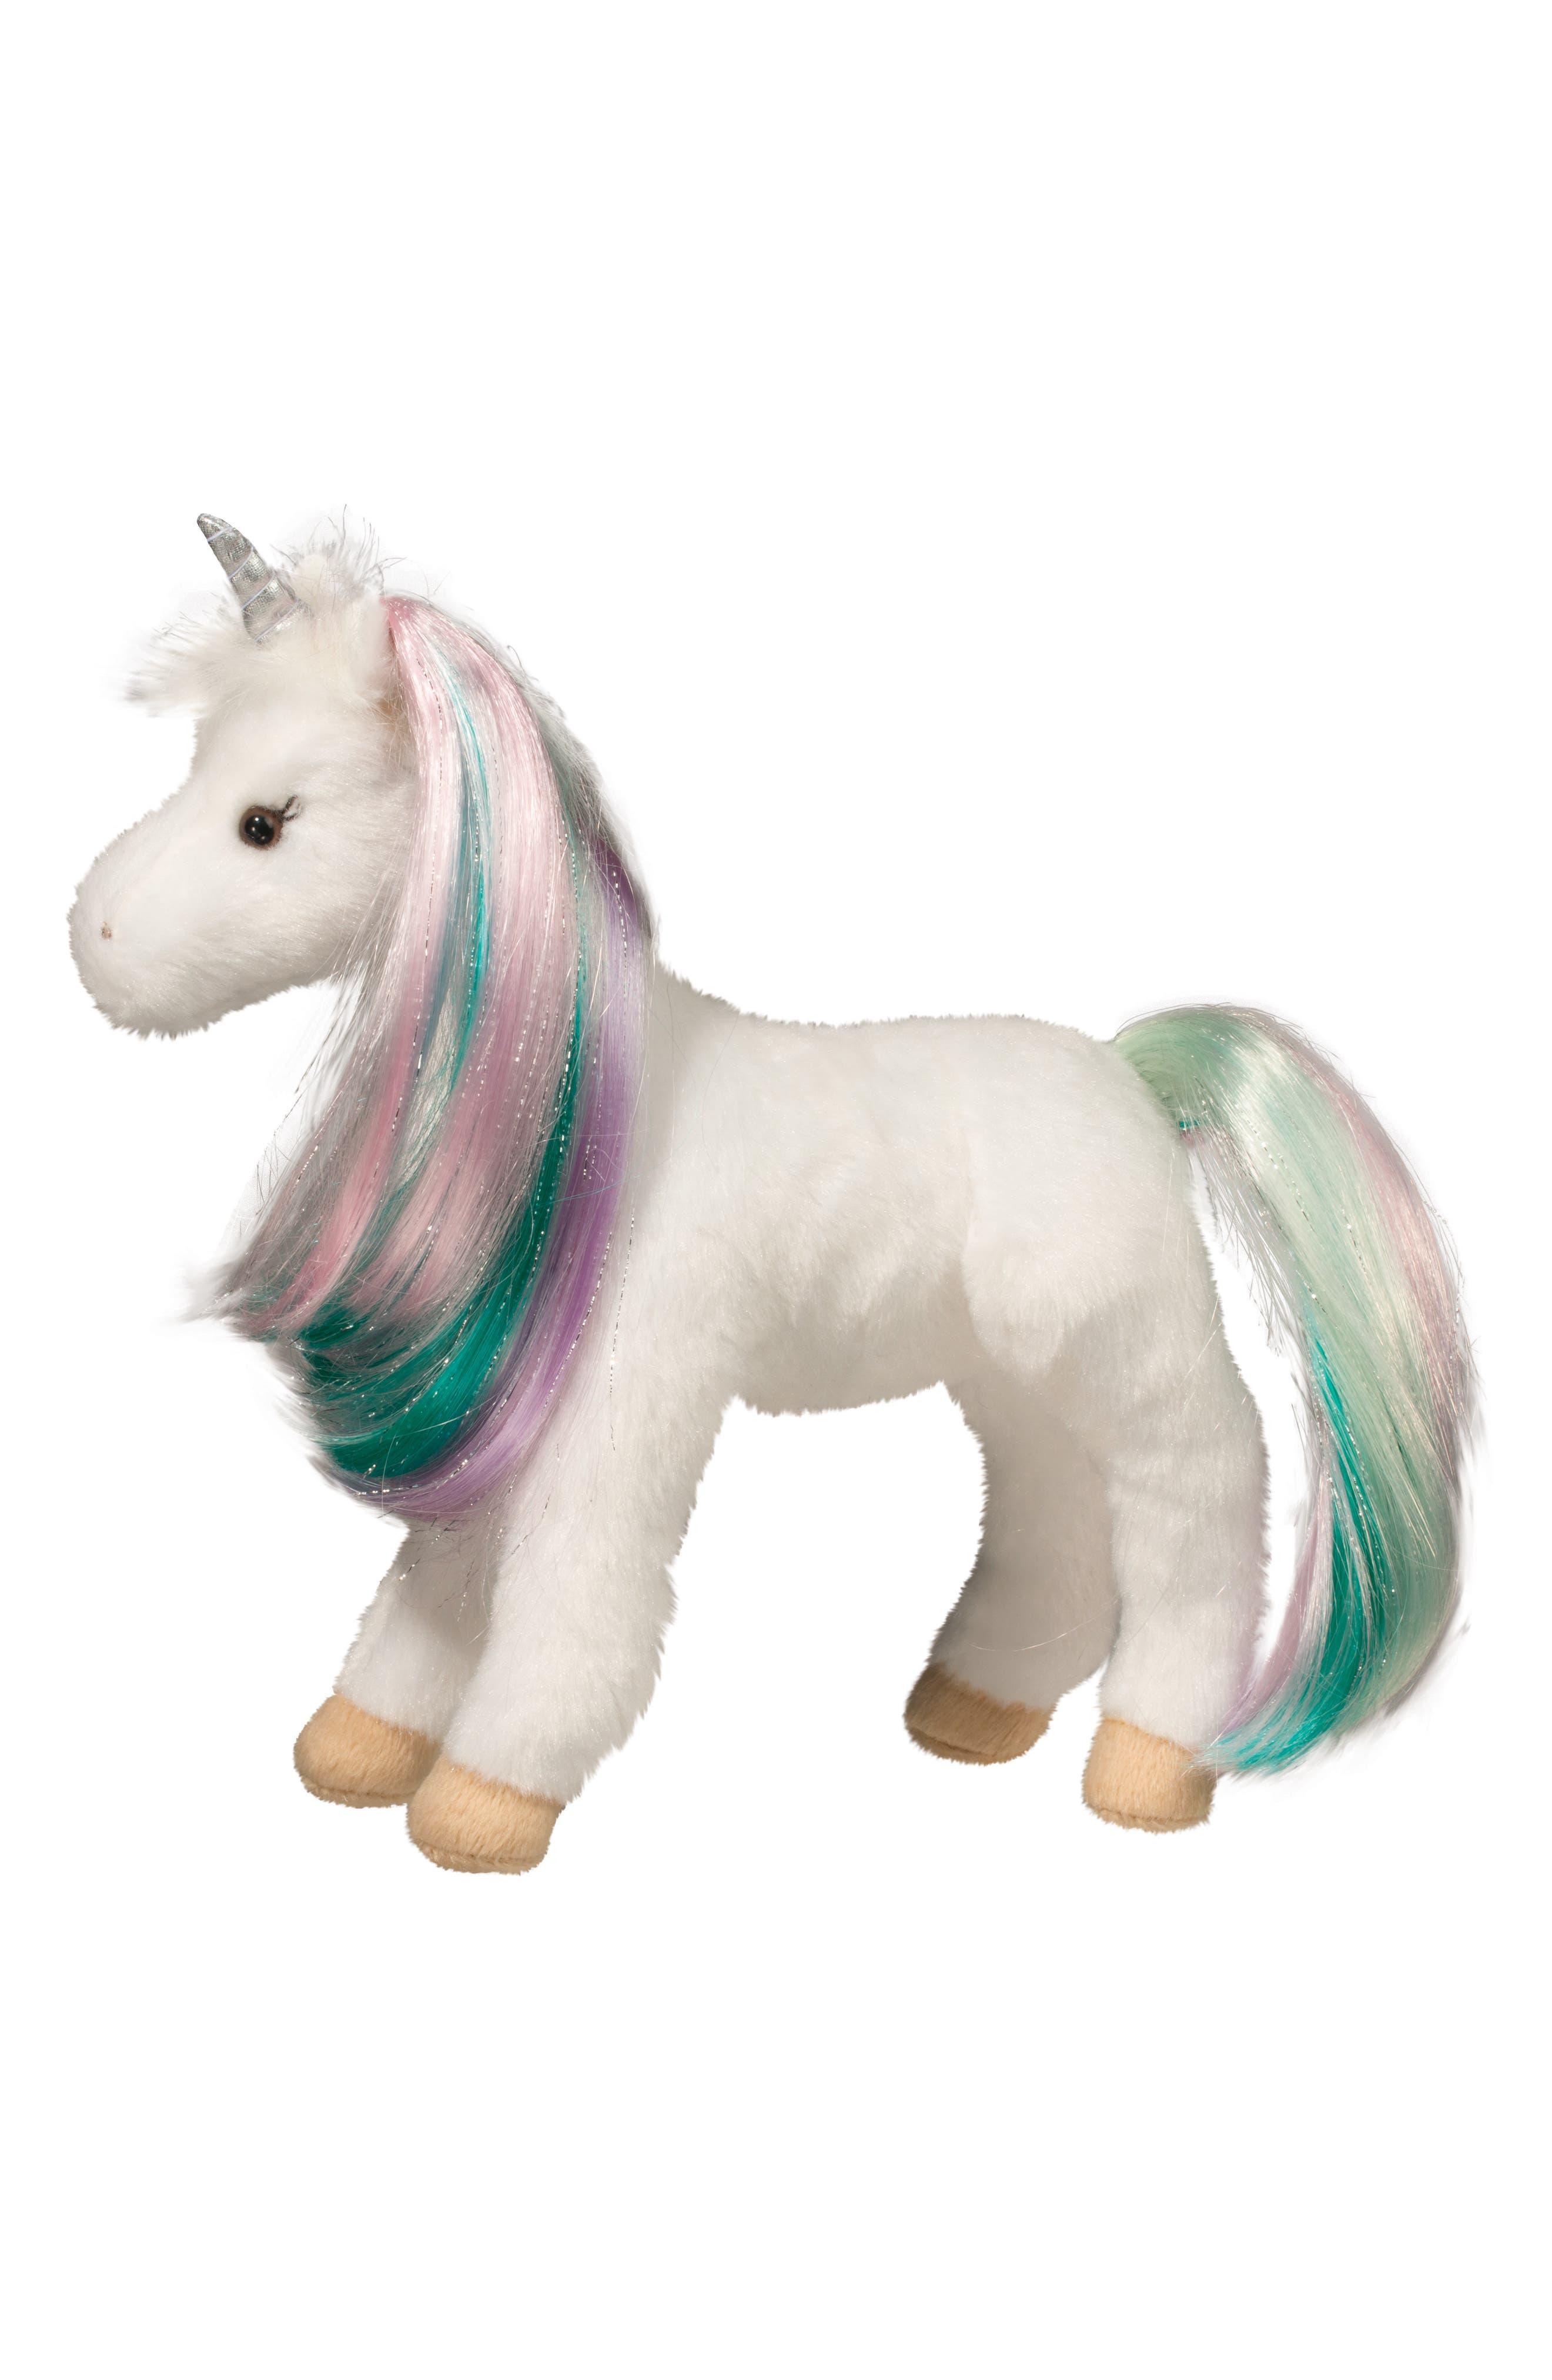 Jules Princess Unicorn Stuffed Animal,                             Main thumbnail 1, color,                             100